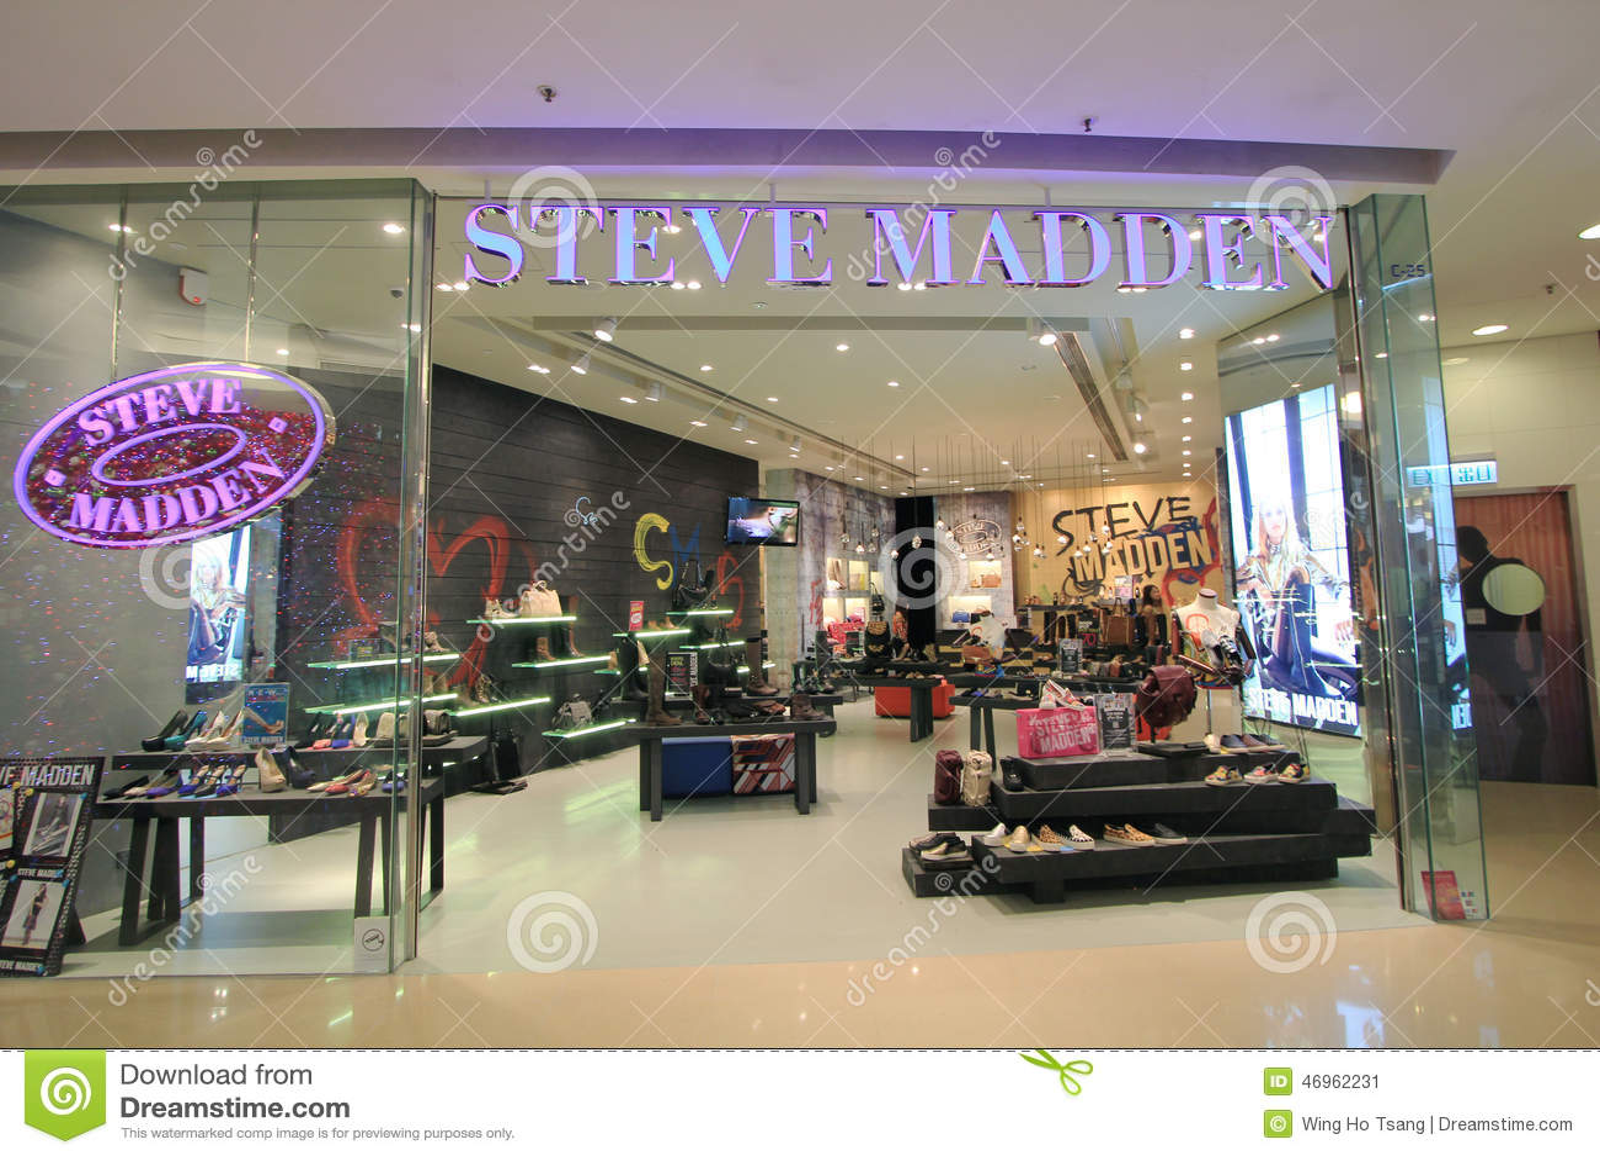 65851488f4f Steve Madden Shop In Hong Kong Editorial Photo - Image of kung ...